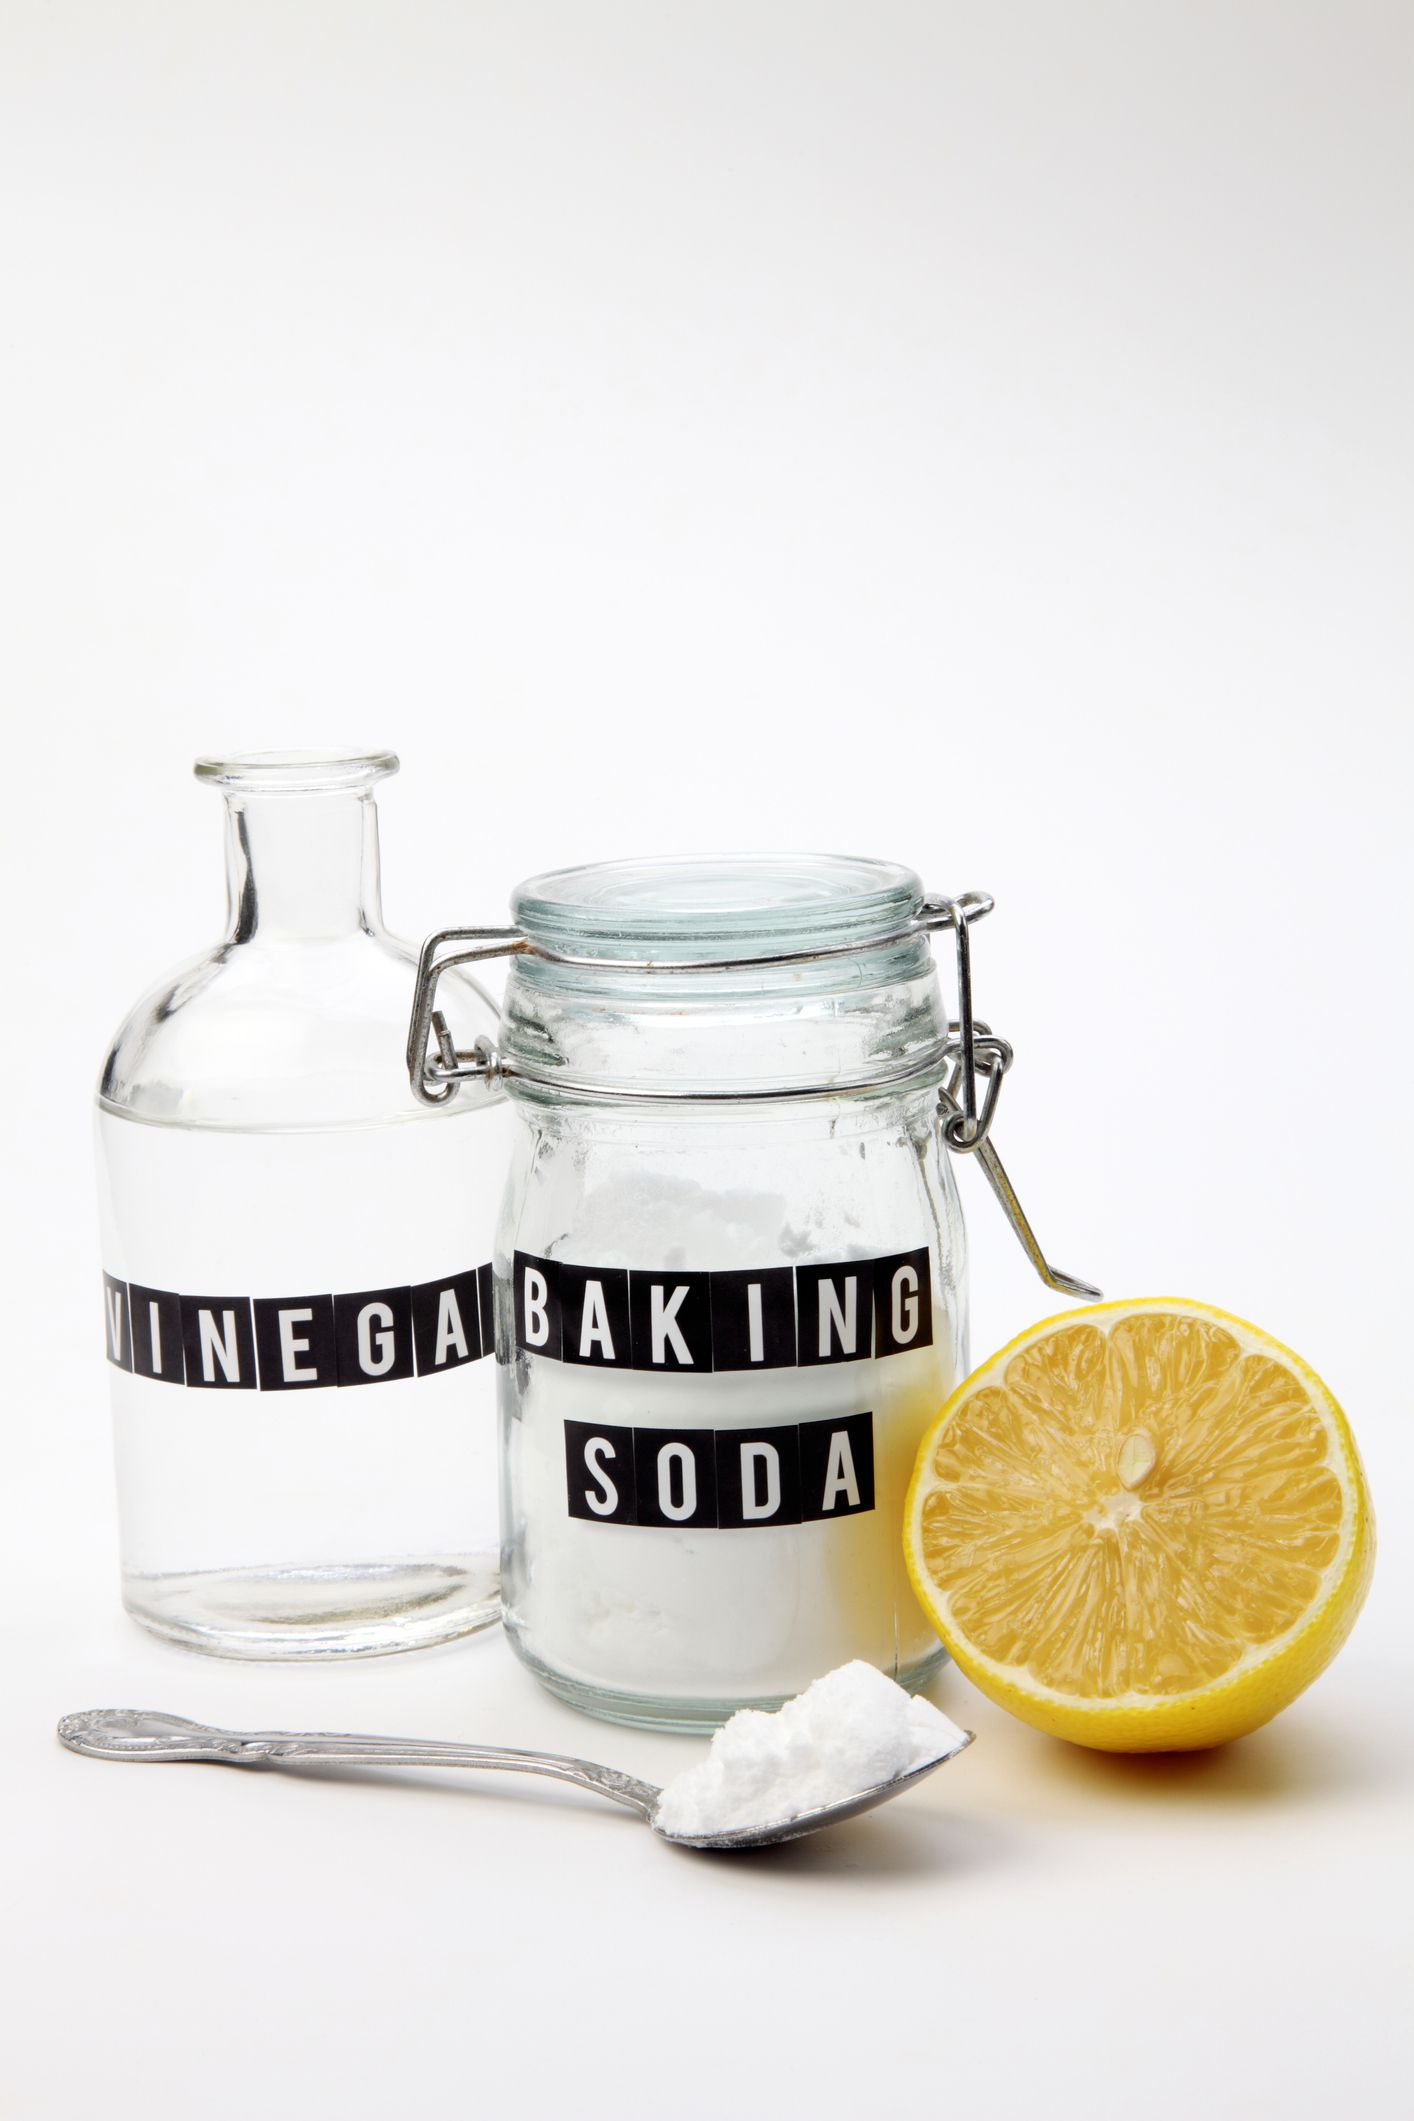 Vinegar and baking soda next to a lemon